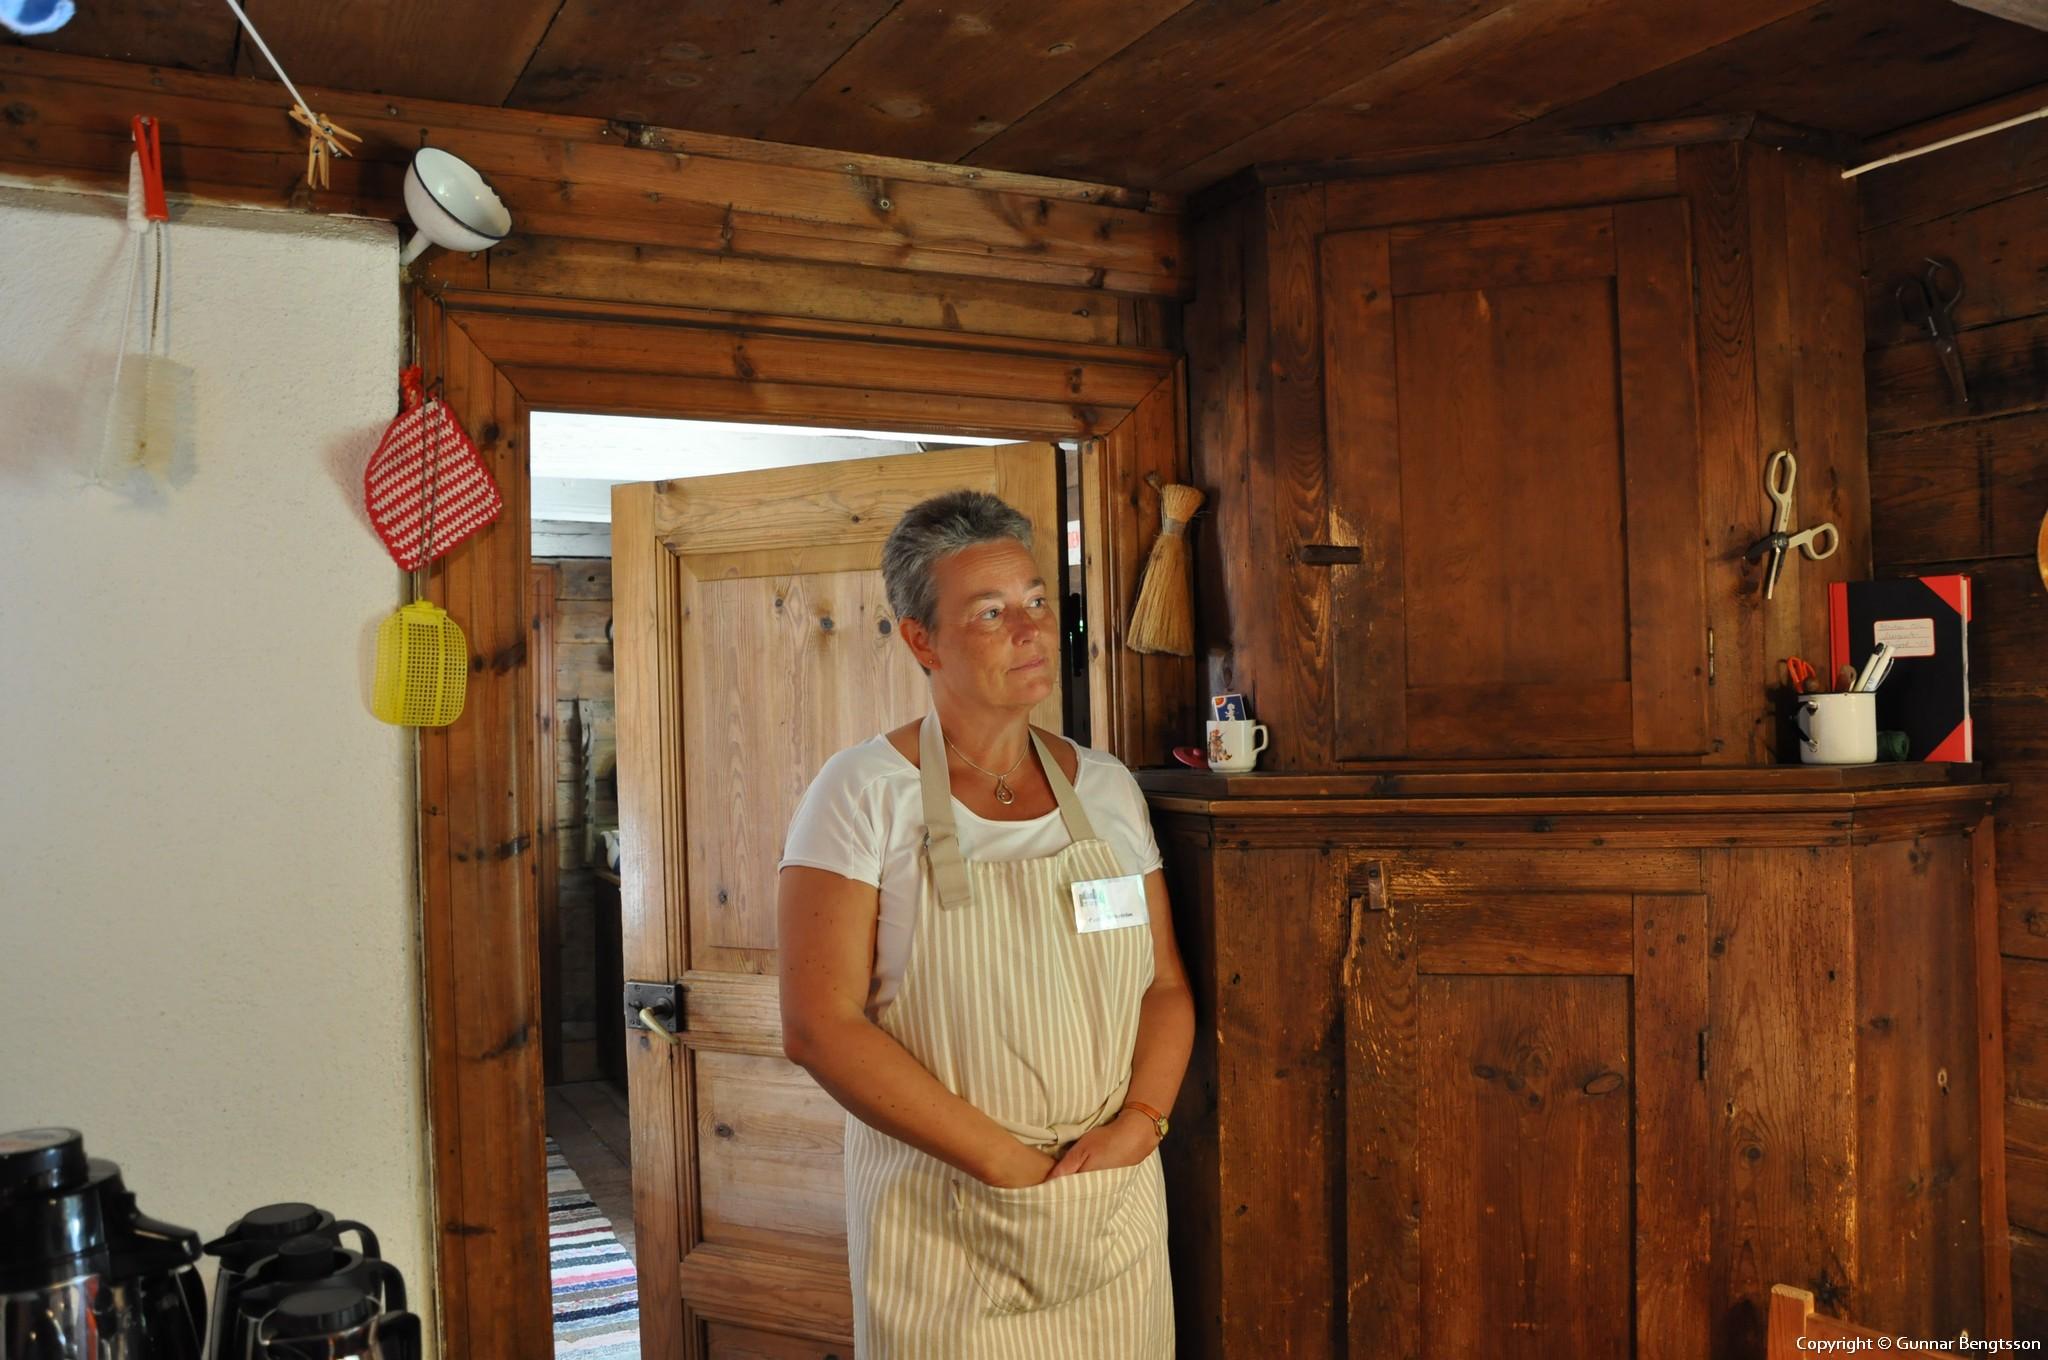 Cecilia i Kråkegårdens kök